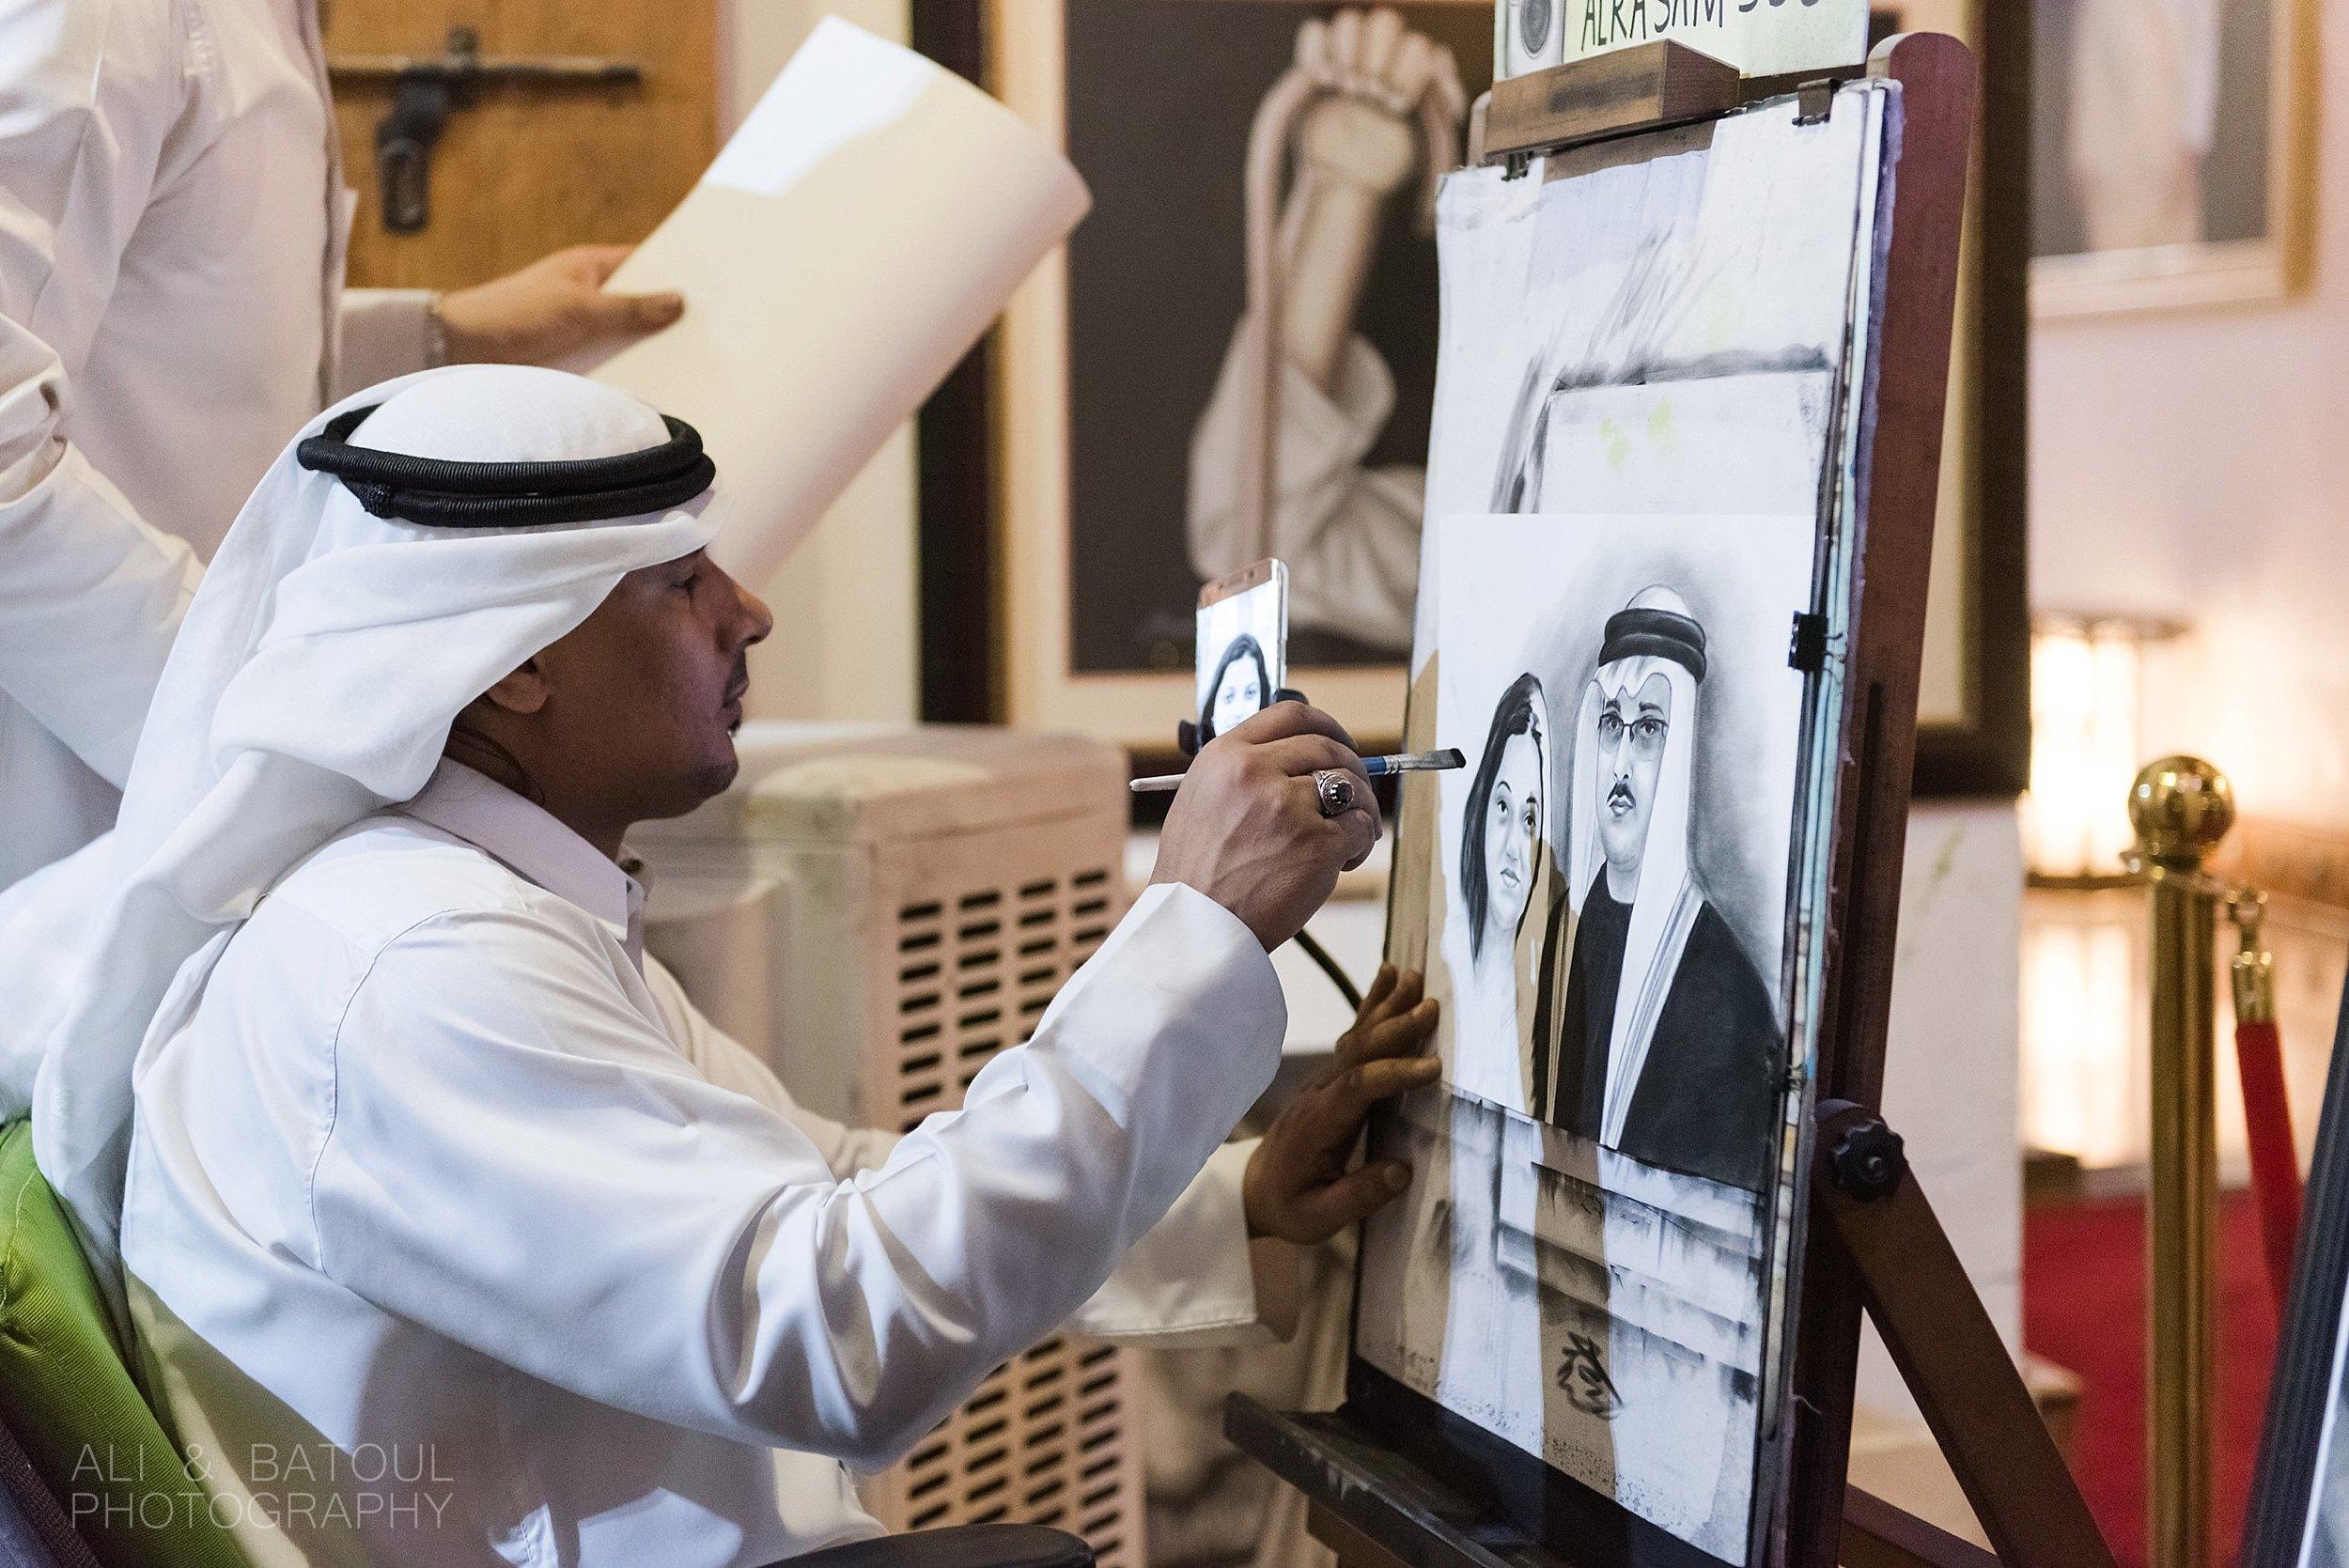 Ali & Batoul Photography - Doha Travel Photography_0028.jpg